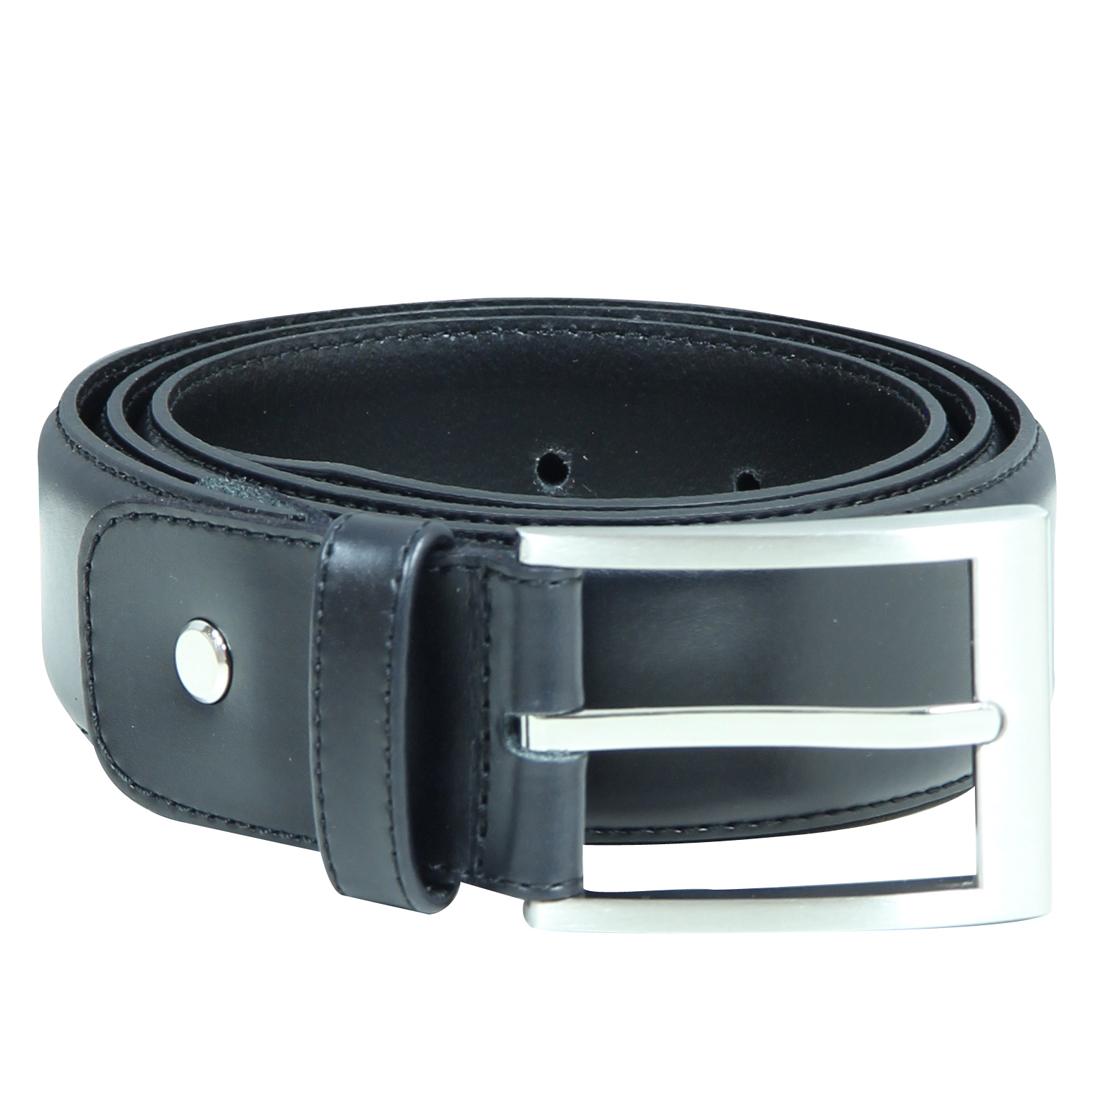 JPLC Pulles Leather Company accessoire 5073 in het Zwart